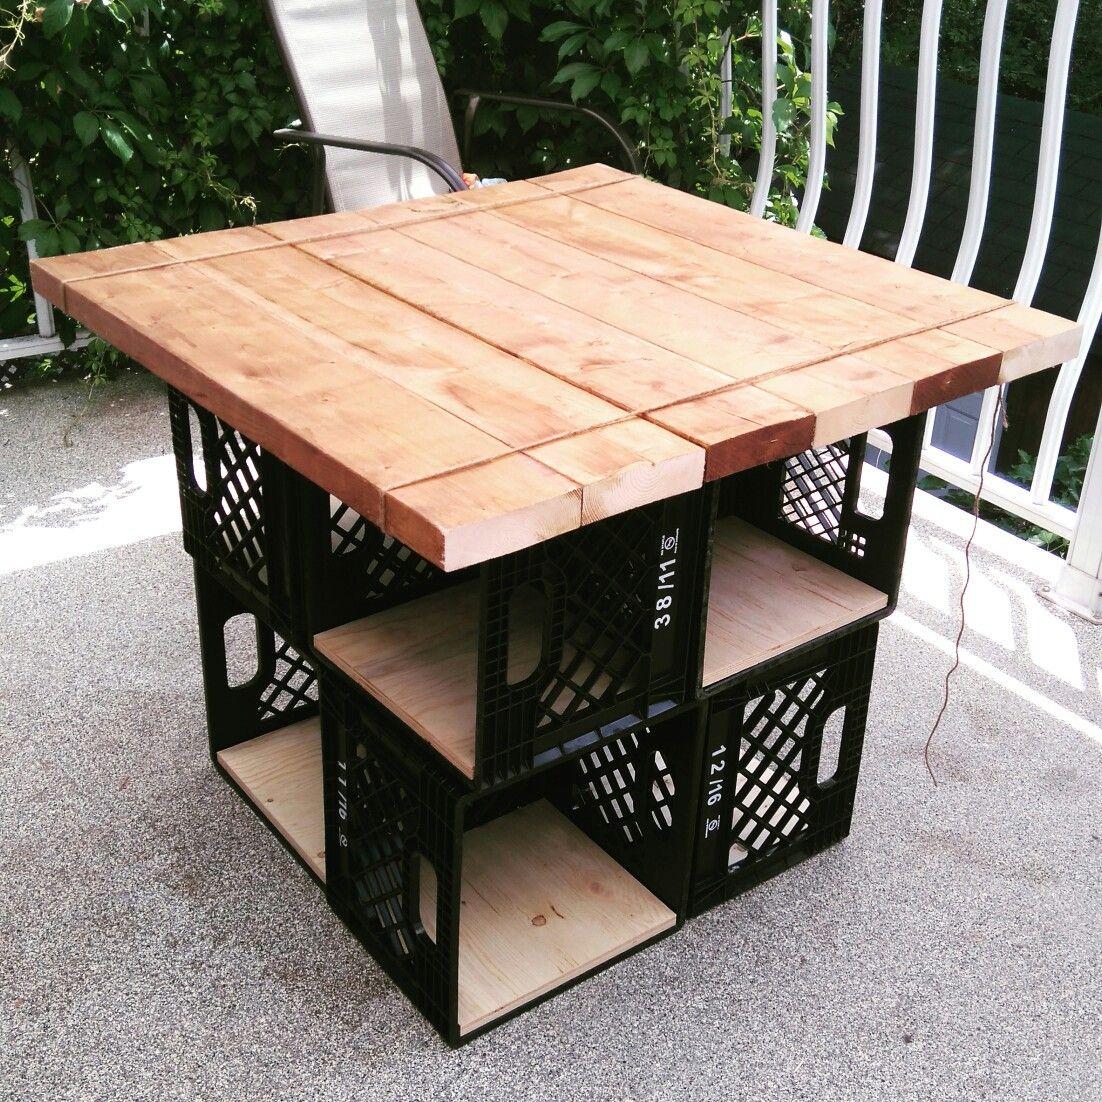 Milk Crates Patio Table With Storage Milk Crate Furniture Crate Furniture Milk Crates Diy